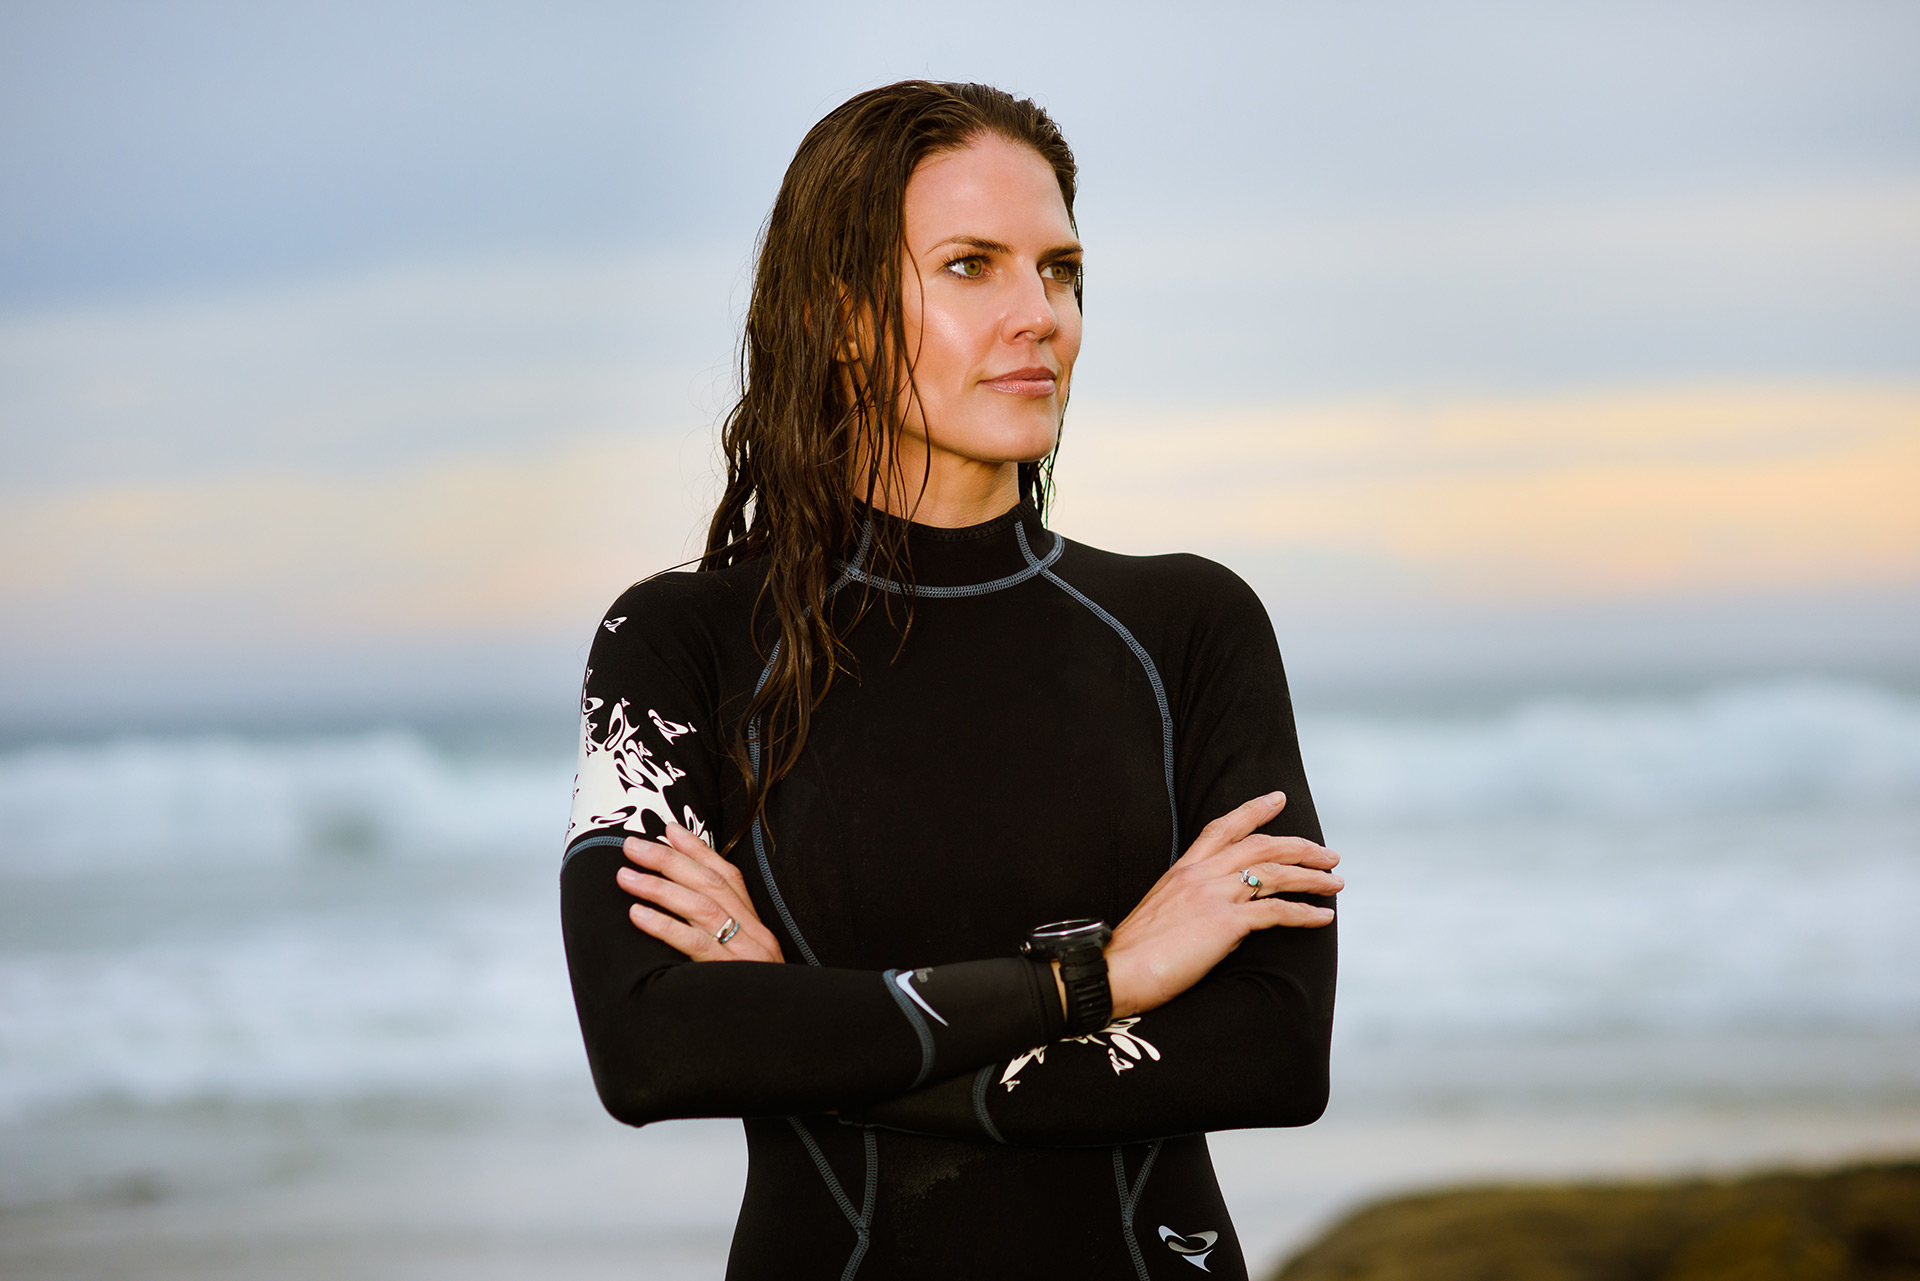 MEGHAN HEANEY-GRIER - OCEAN EXPLORER